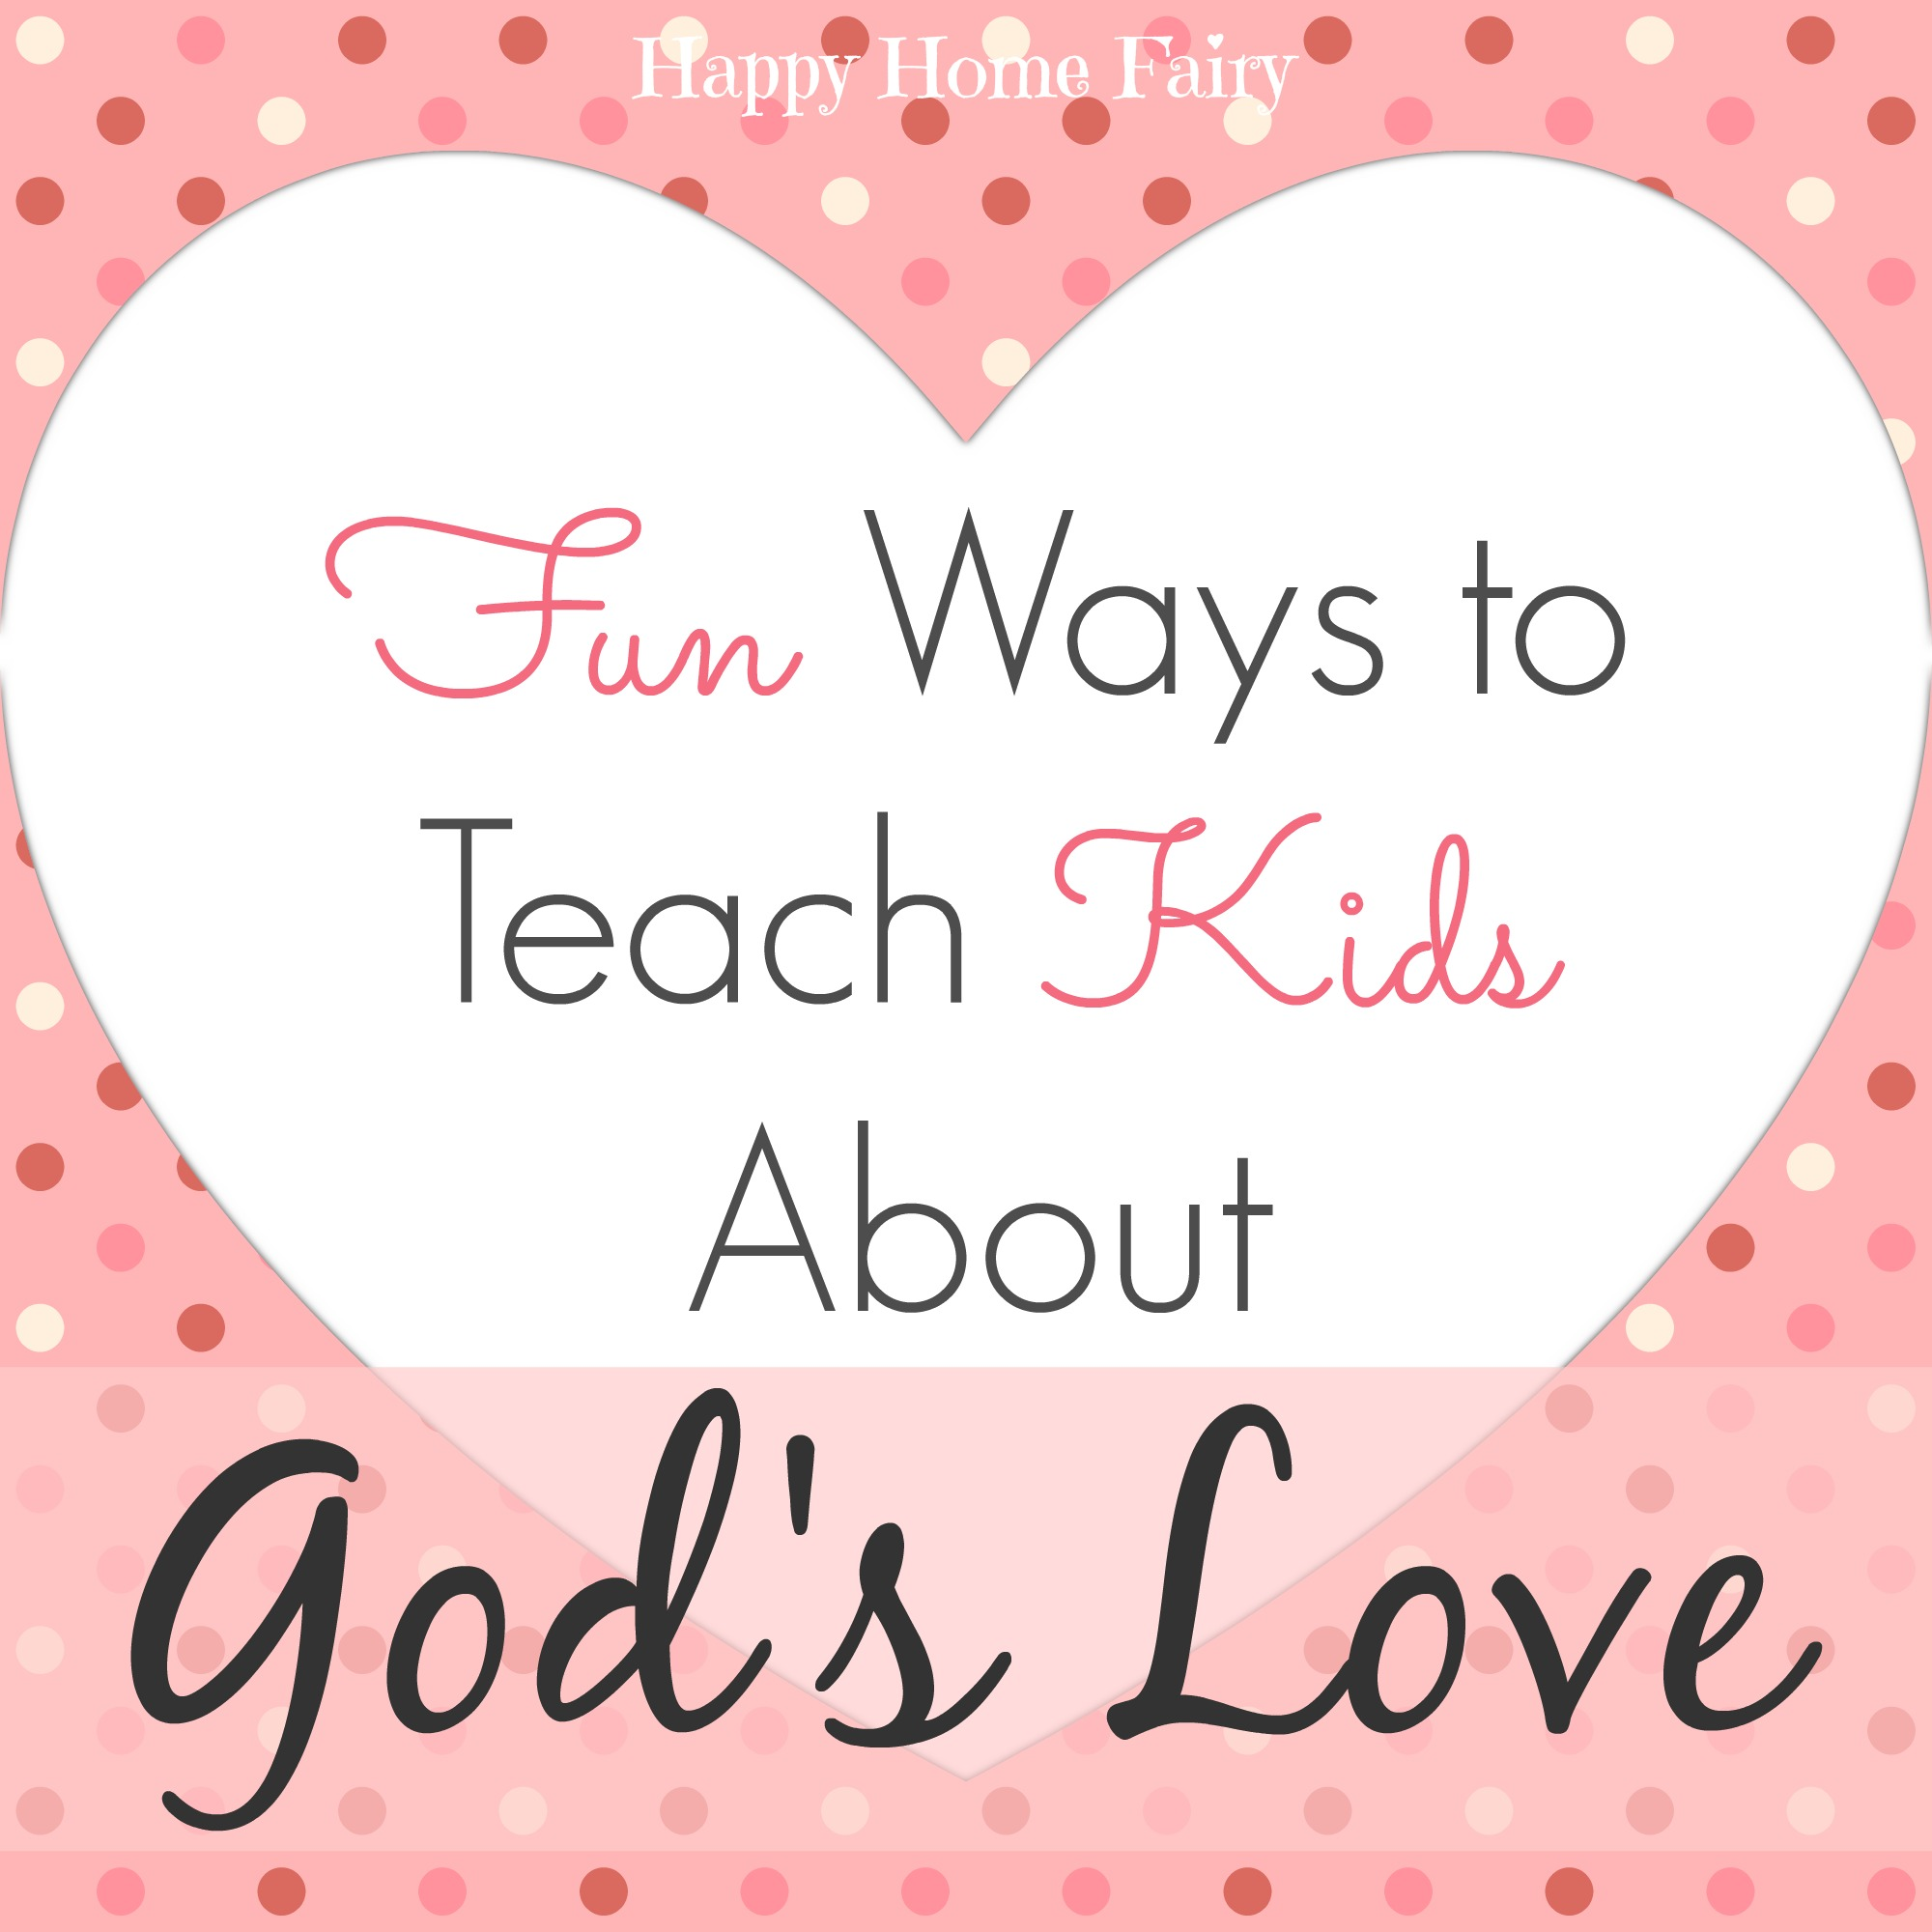 Fun Ways to Teach Kids About Gods Love  Happy Home Fairy